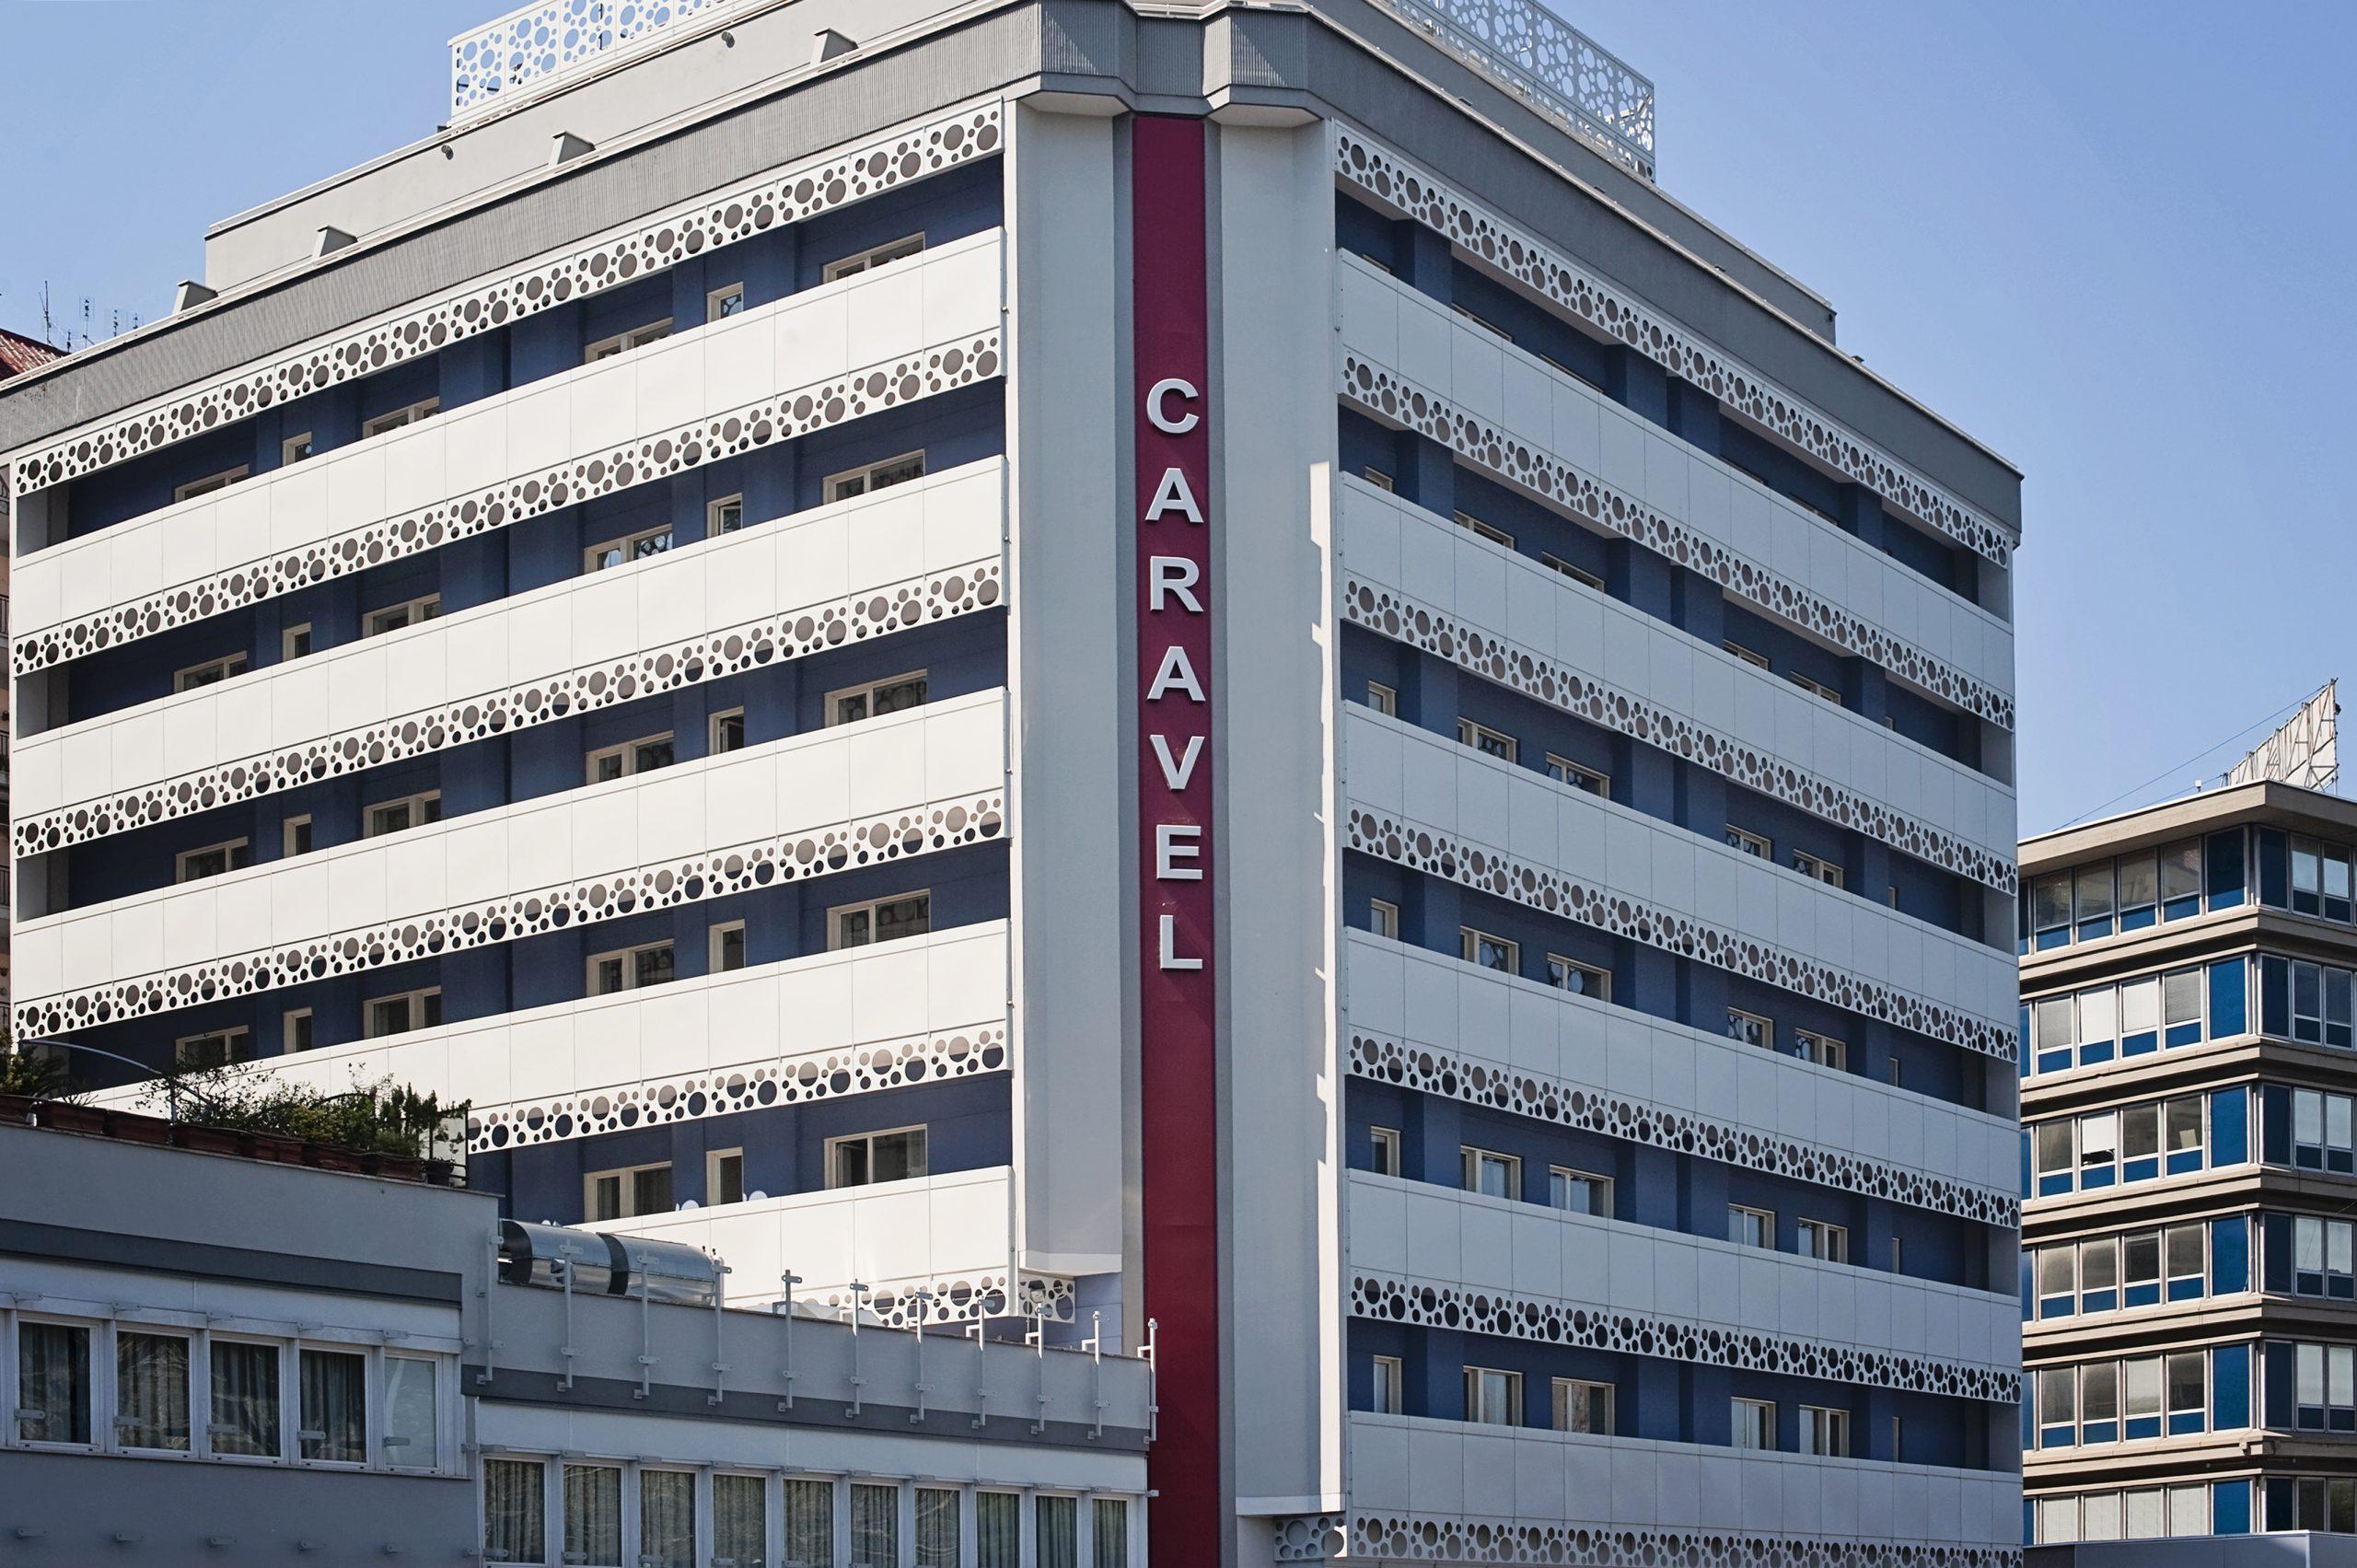 caravel1